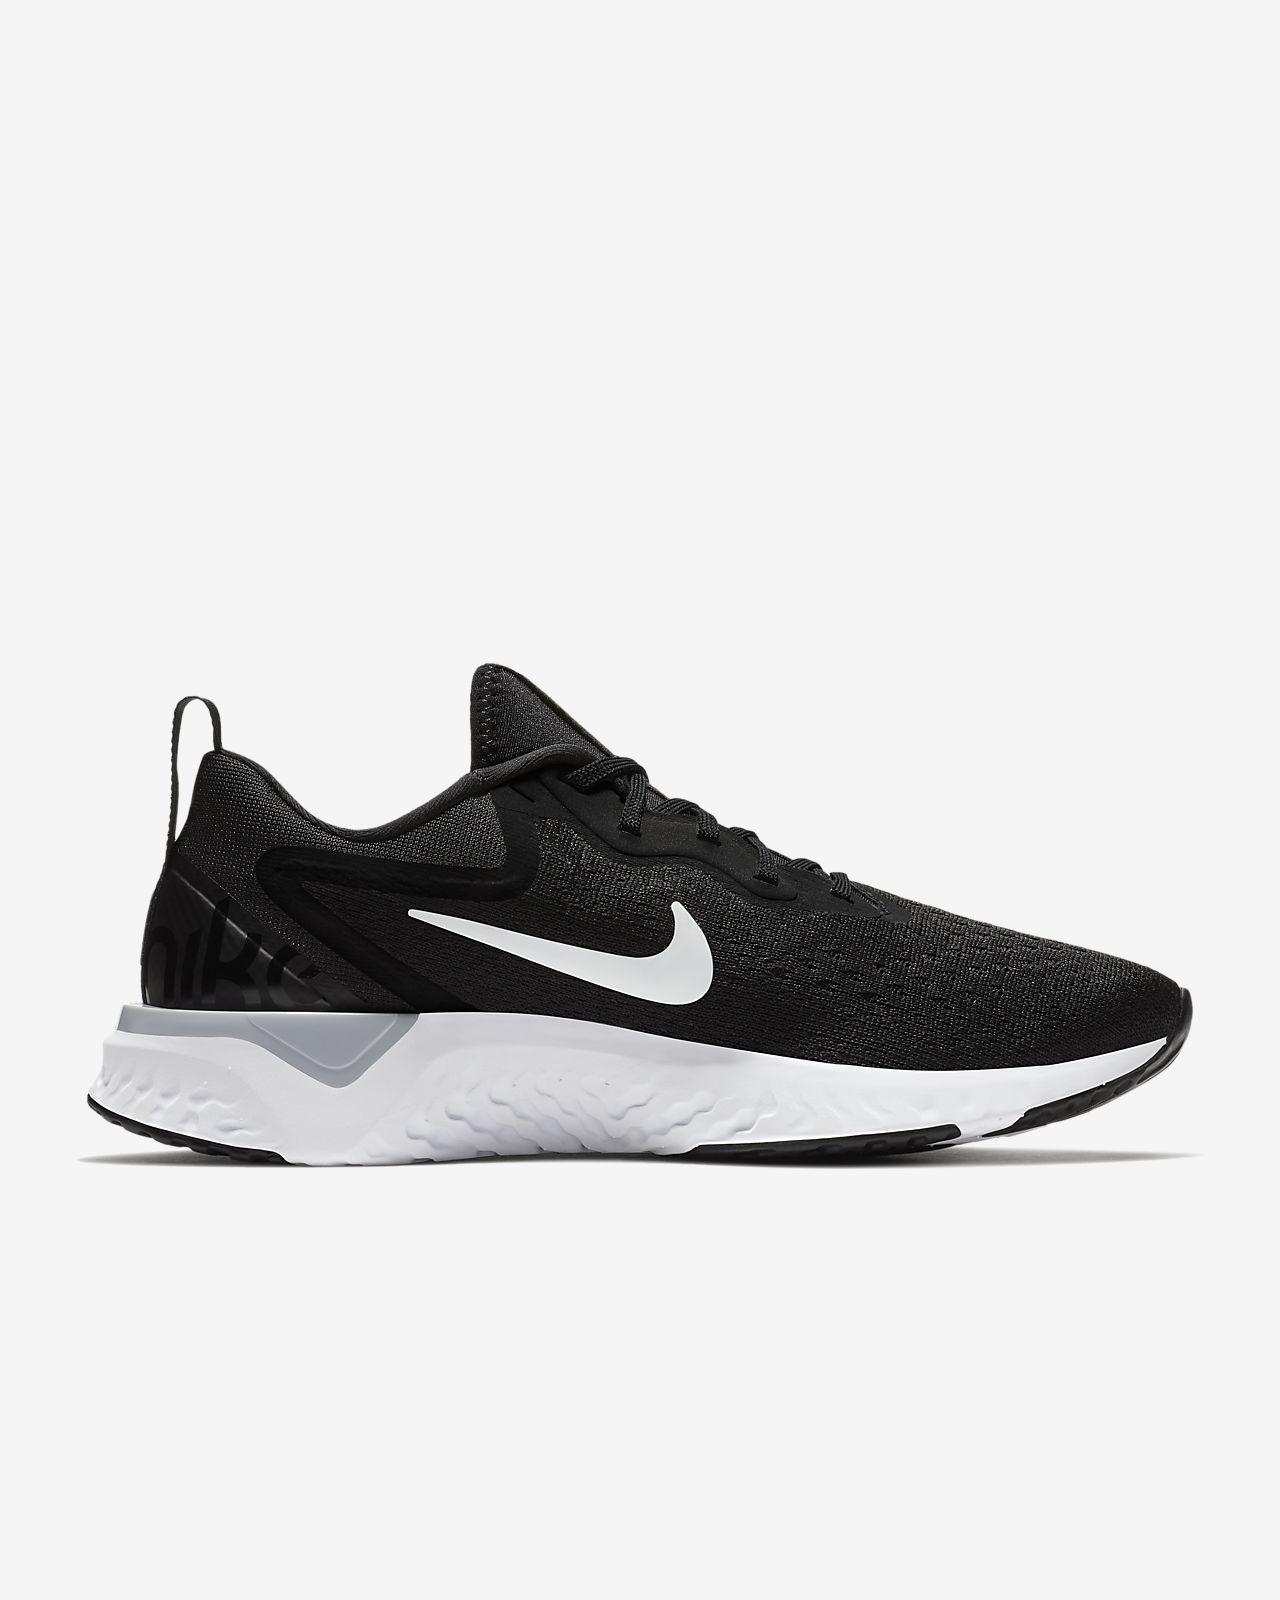 NEW Womens Nike Flex Trainer 6 Running Shoes 831217 001 Size 11.5 BlackWhite